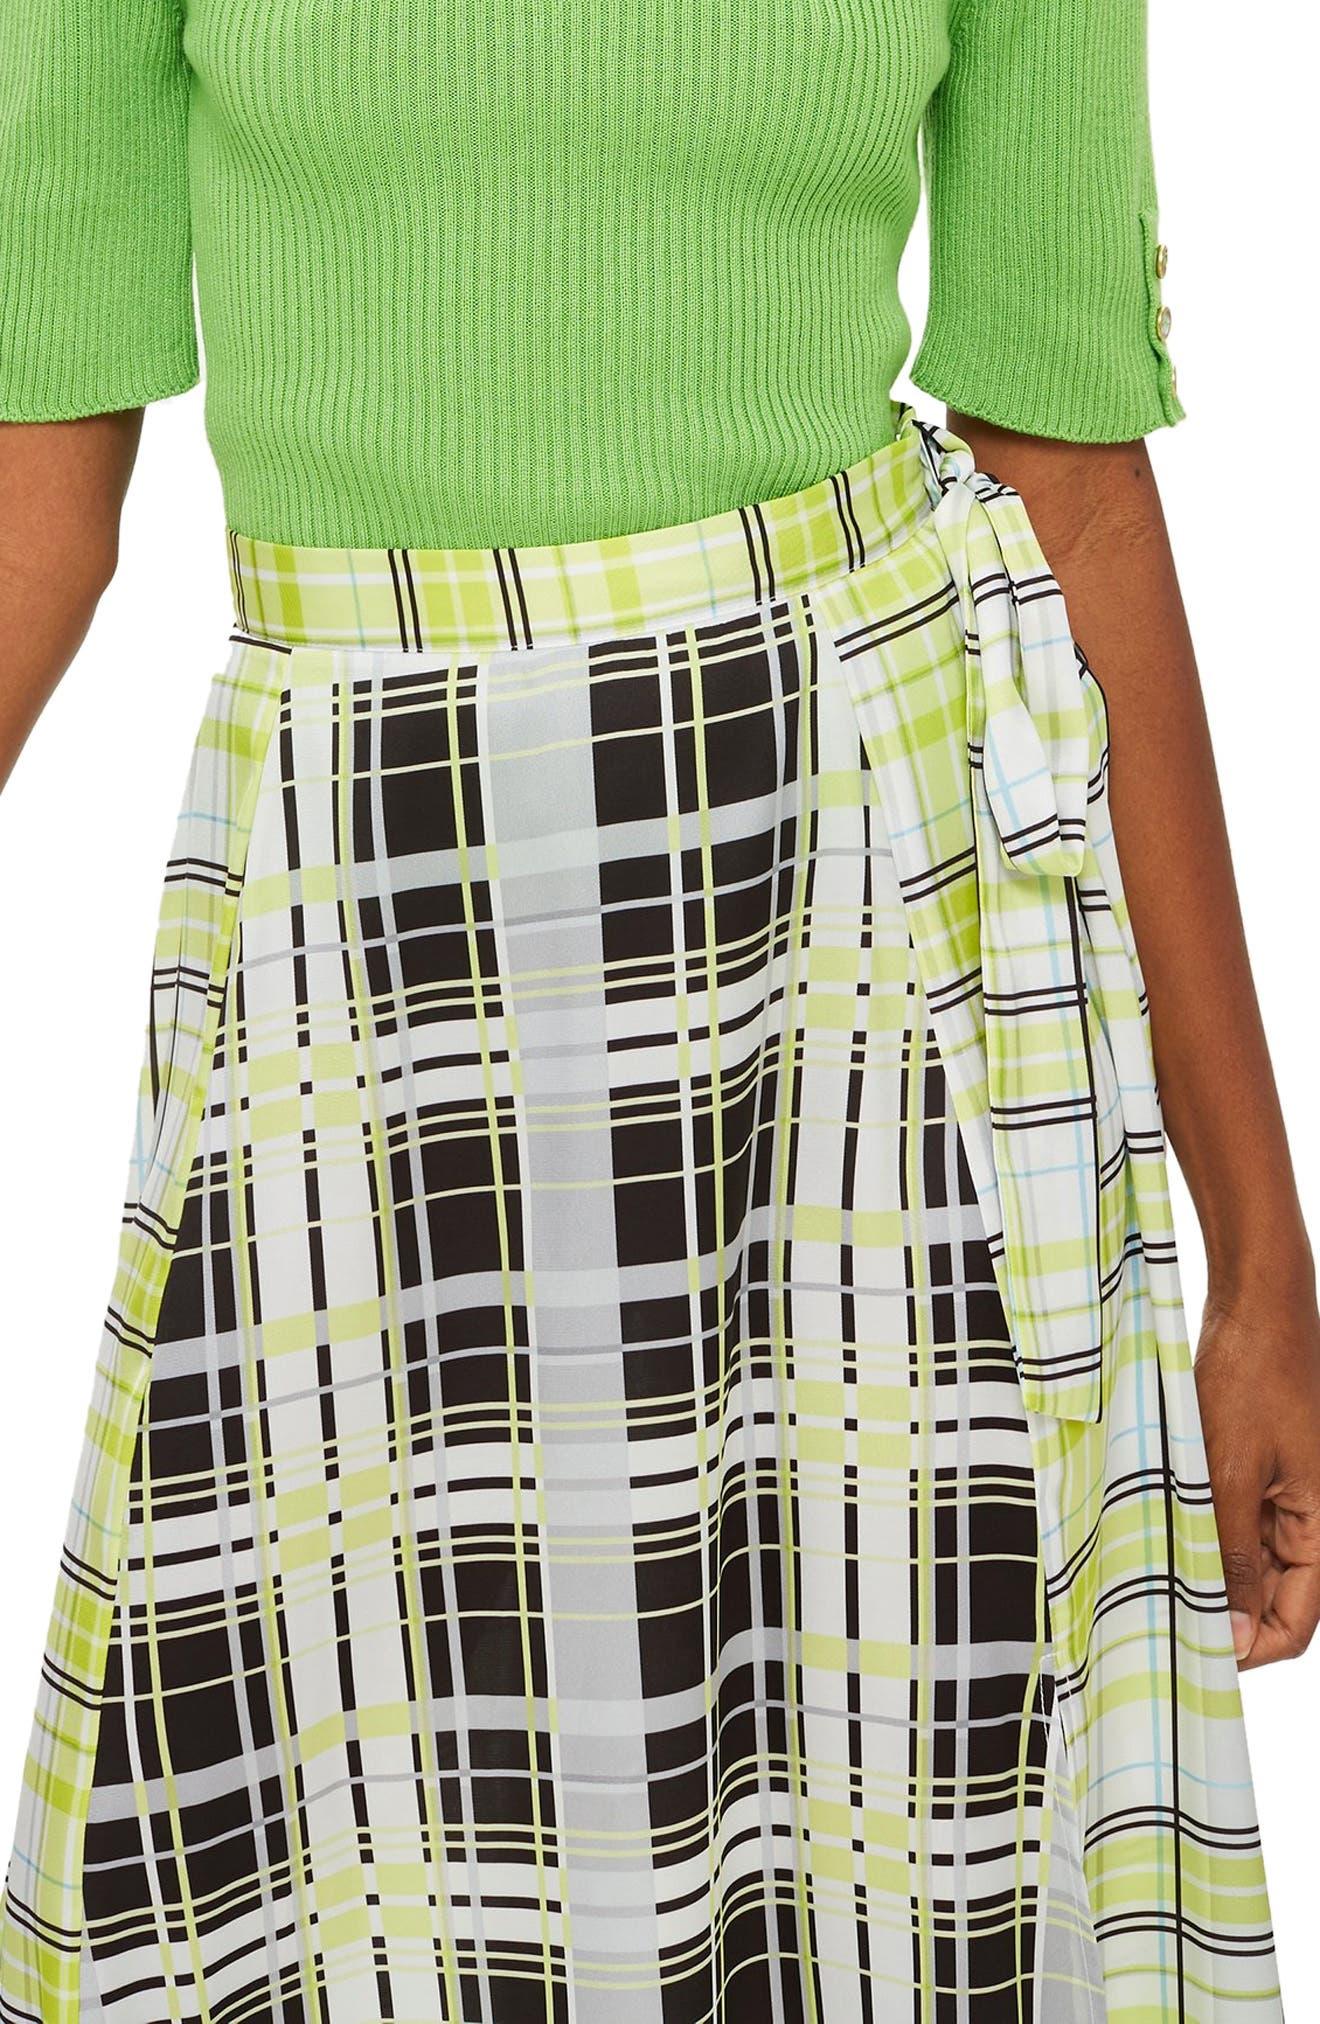 Topshop Obsession Mixed Check Print Midi Skirt